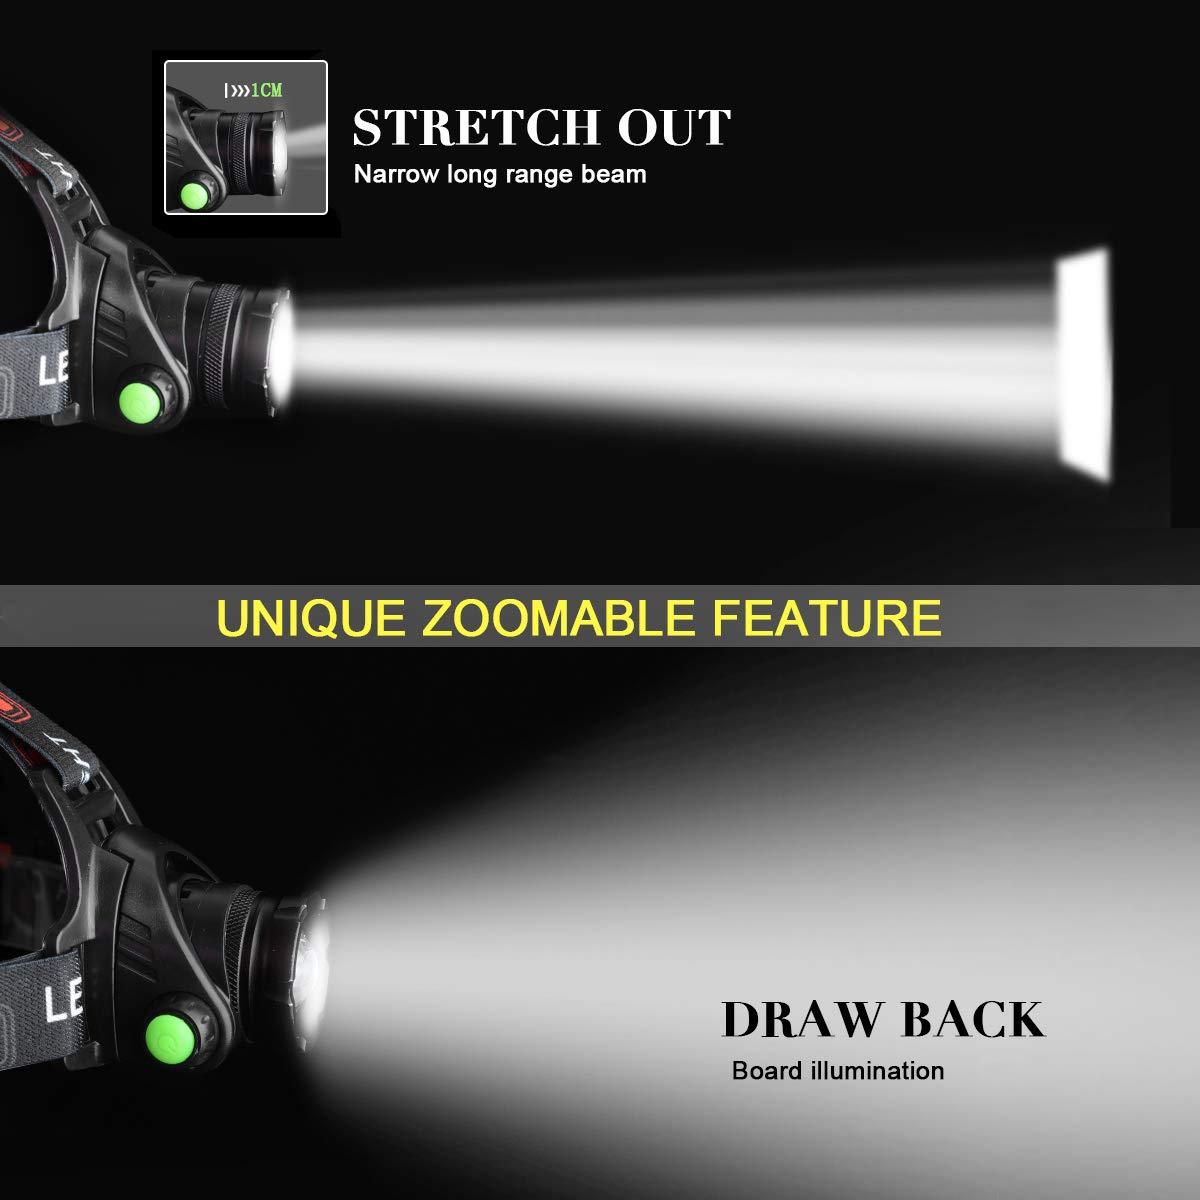 Linternas LED Alta Potencia 6000K IPX6 Impermeable para Camping Pesca Excursi/ón Cobiz Linterna Frontal LED USB Recargable Carrera Linterna Cabeza 4 Modos Ciclismo